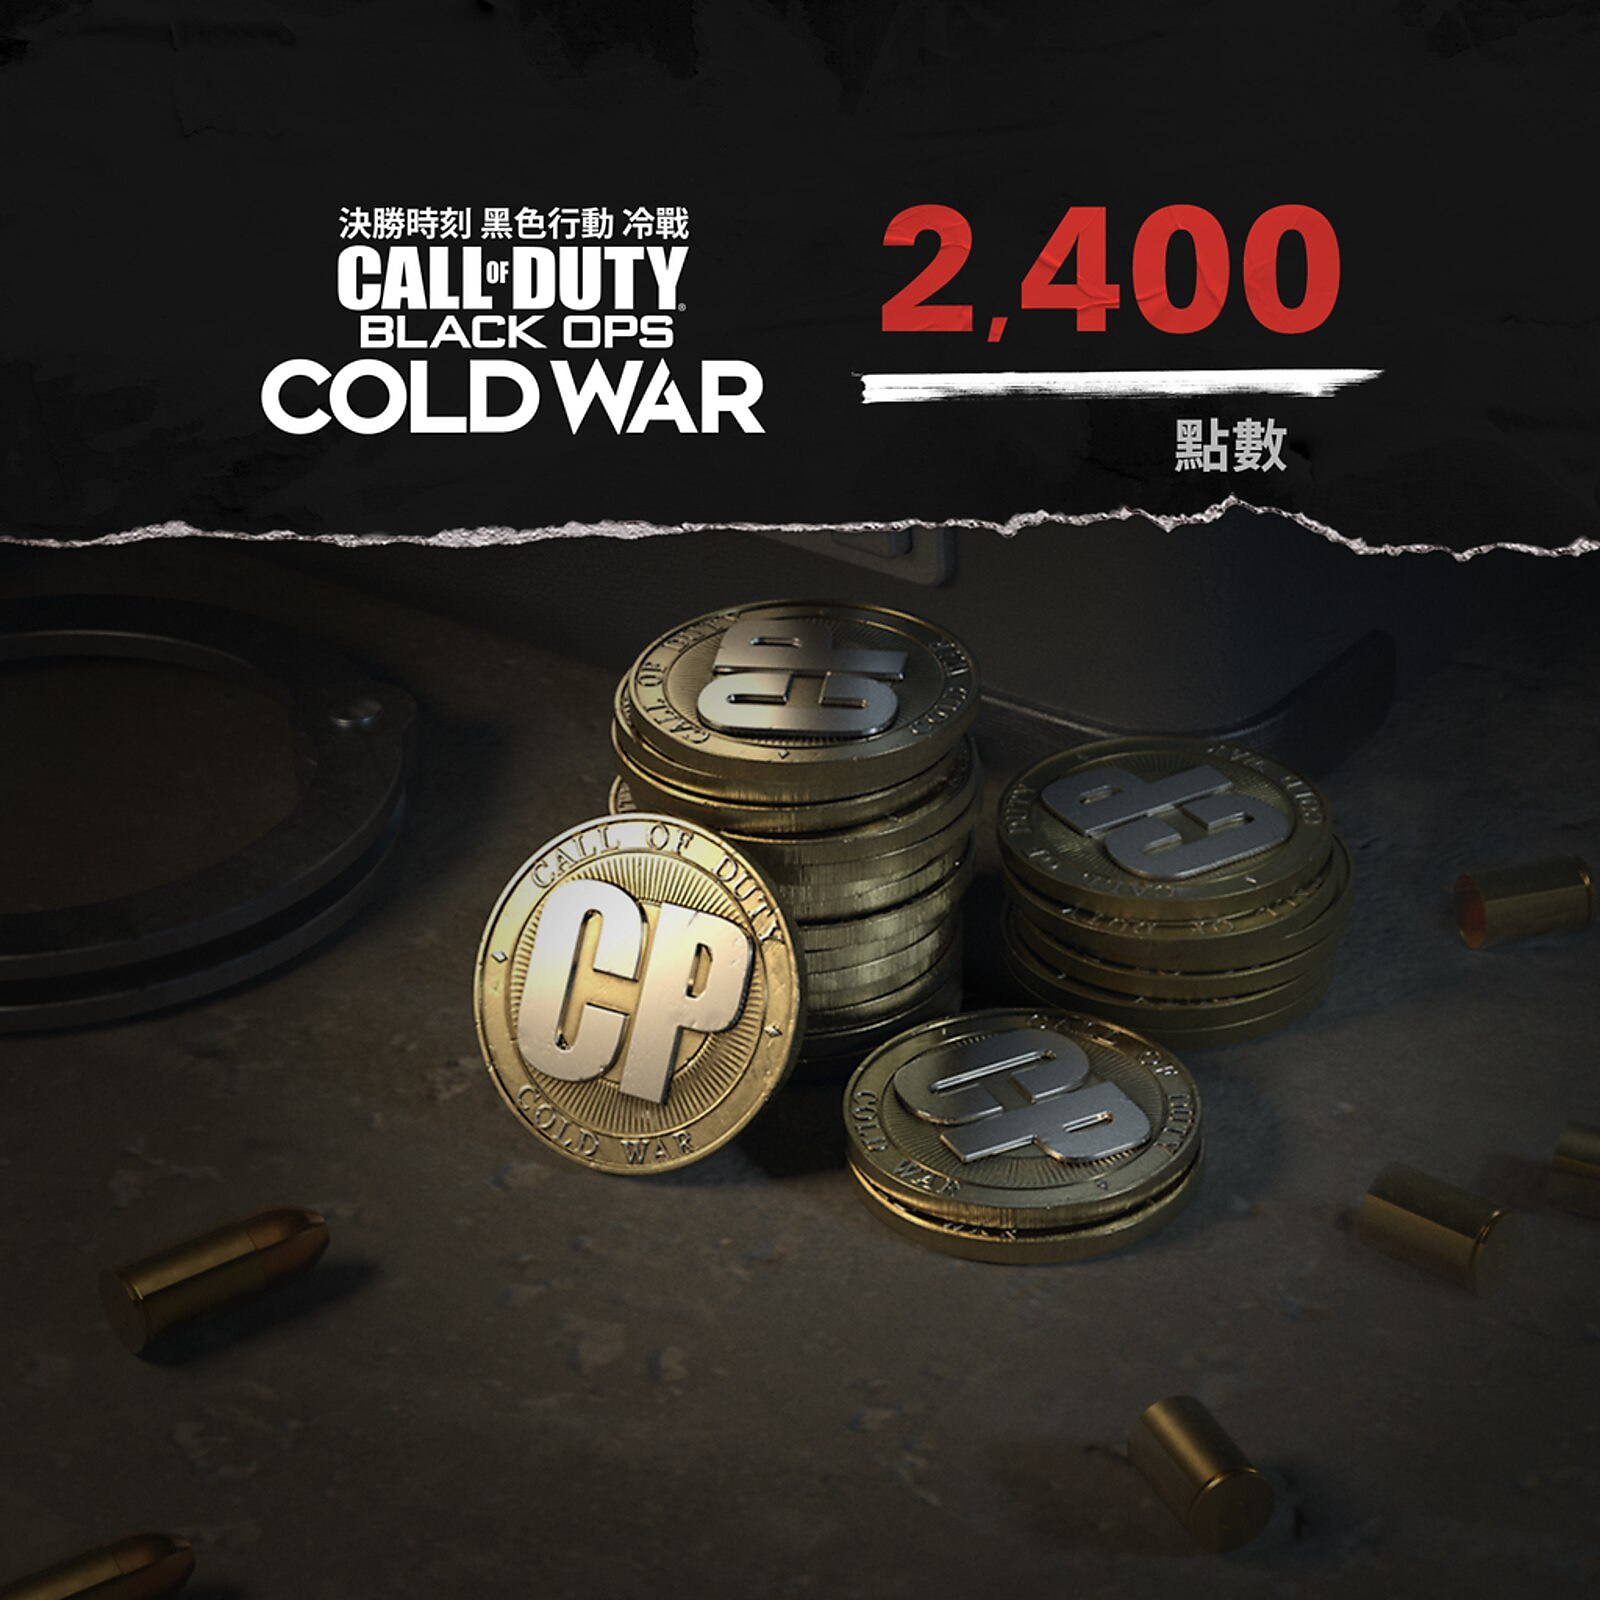 Call of Duty Black Ops Cold War points 2400 packshot